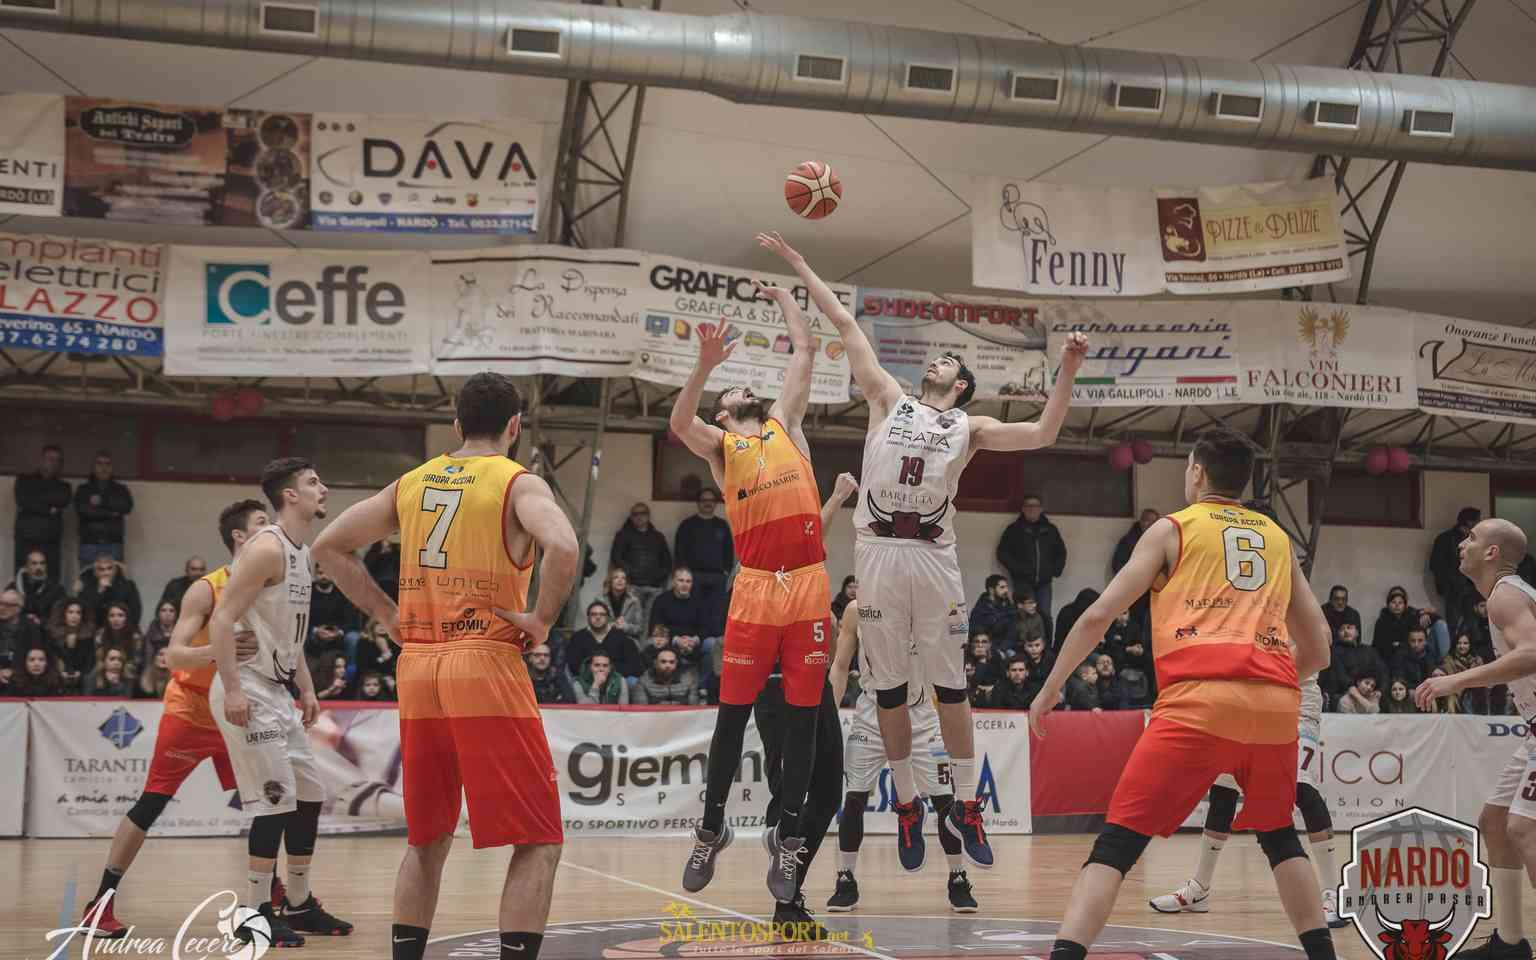 nardo-basket-giulianova-030219